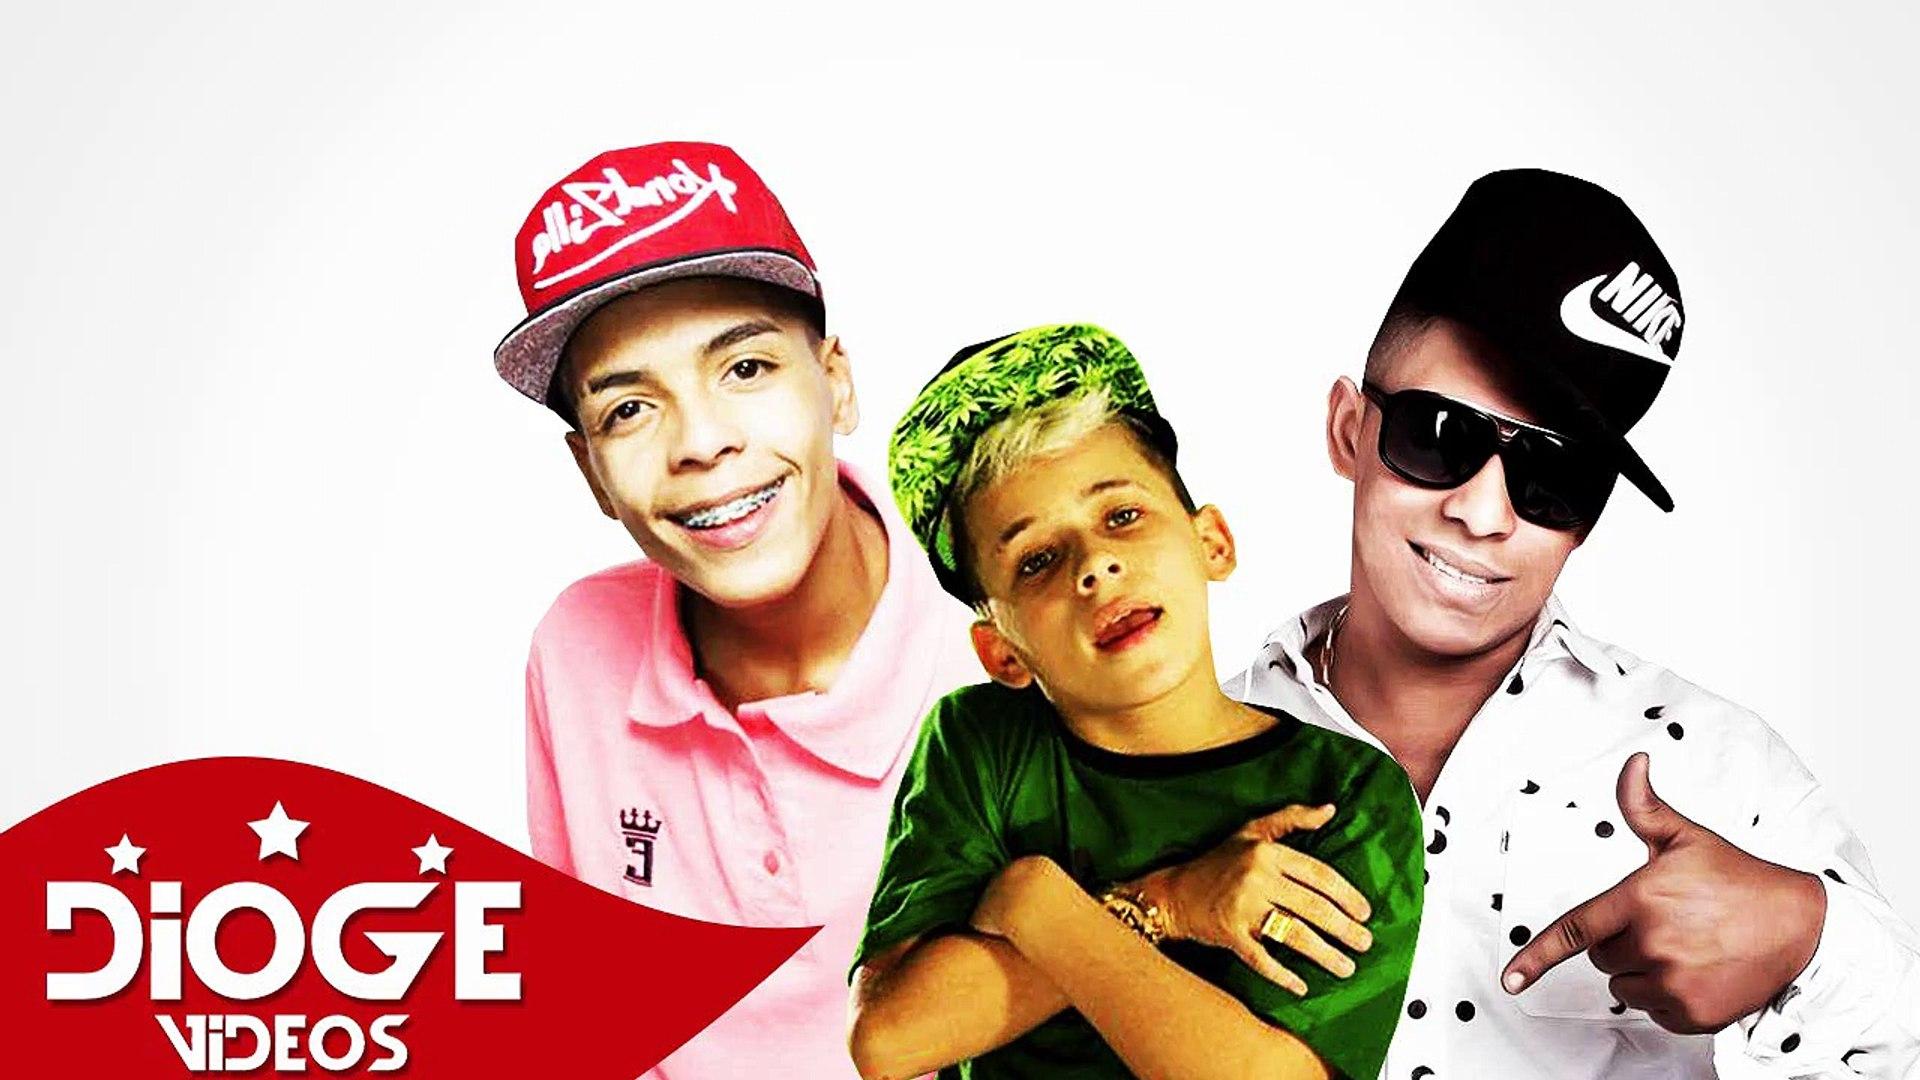 MC Kevin, MC Pedrinho e MC Italo - Chupa lambe , Lambem Chupa ( DJ Menor SP ) Lançamento Oicial 2015